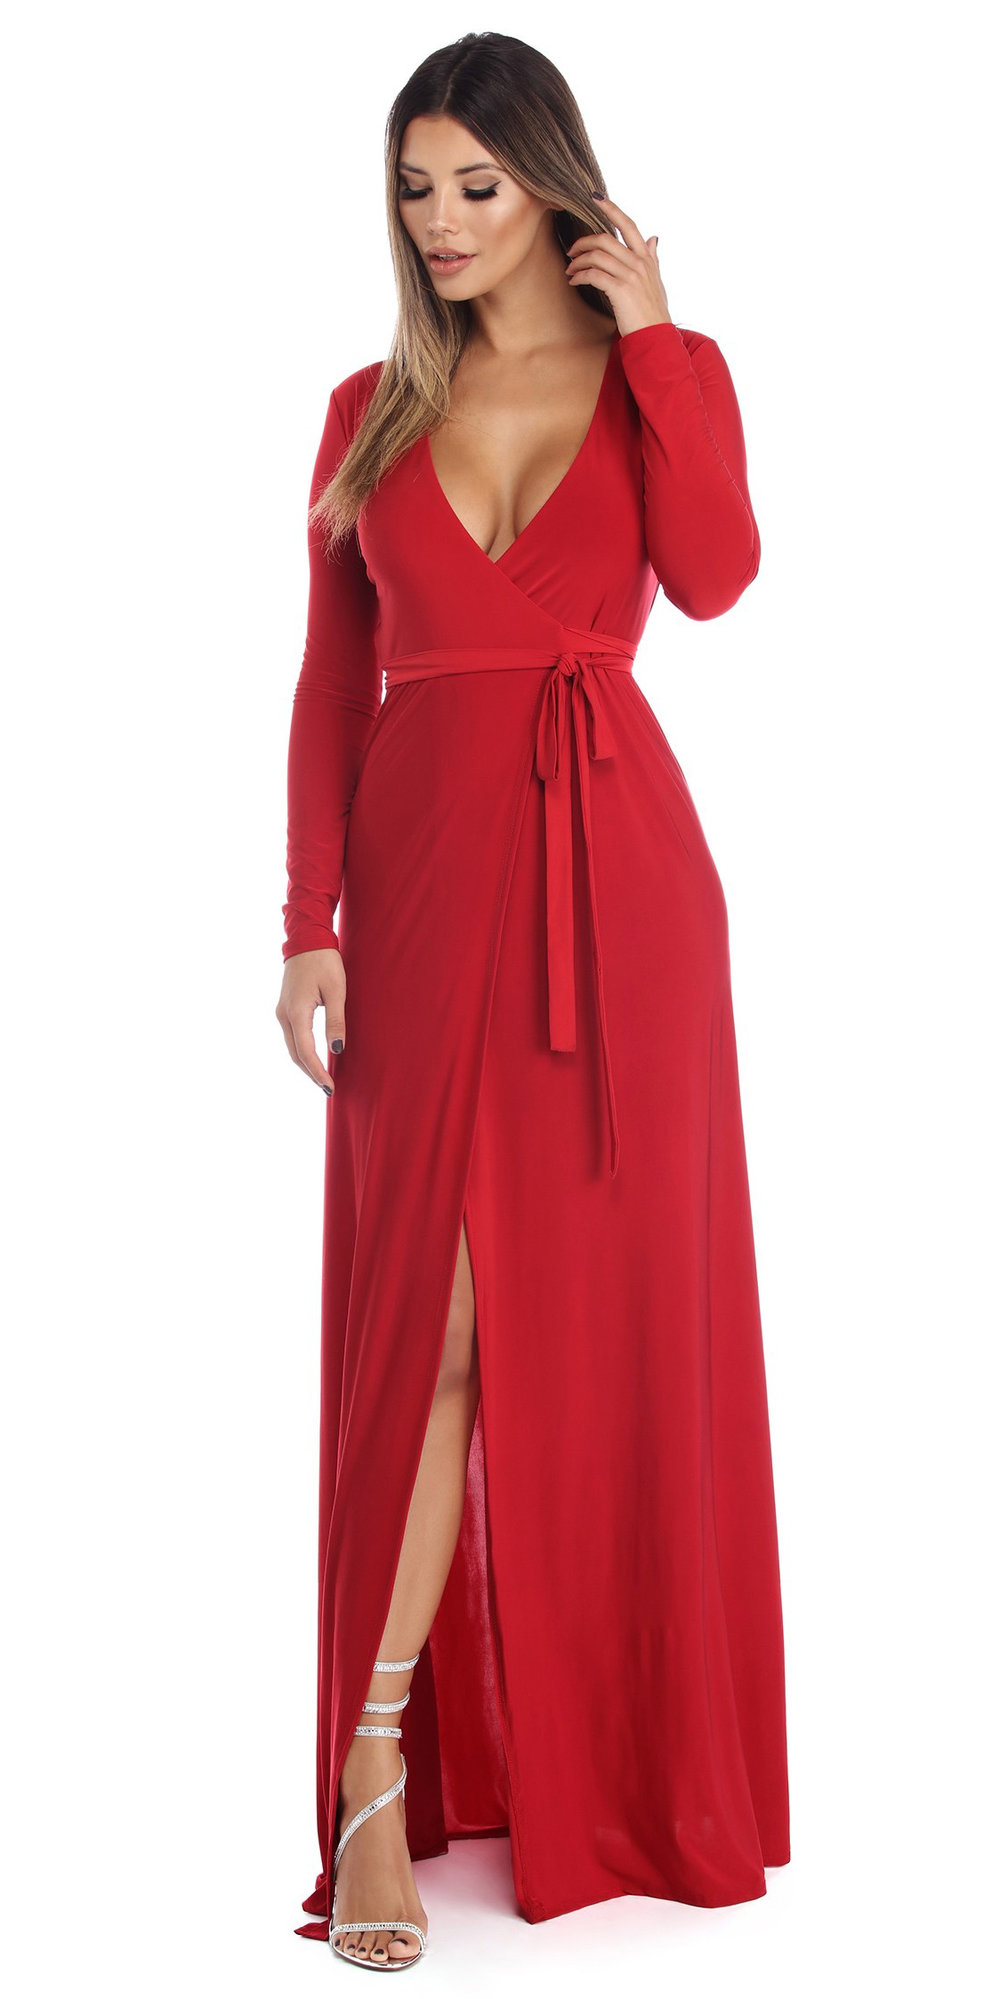 cf05afa8bb2 red-dress-wrap-maxi-white-shoe-sandalh-fall-